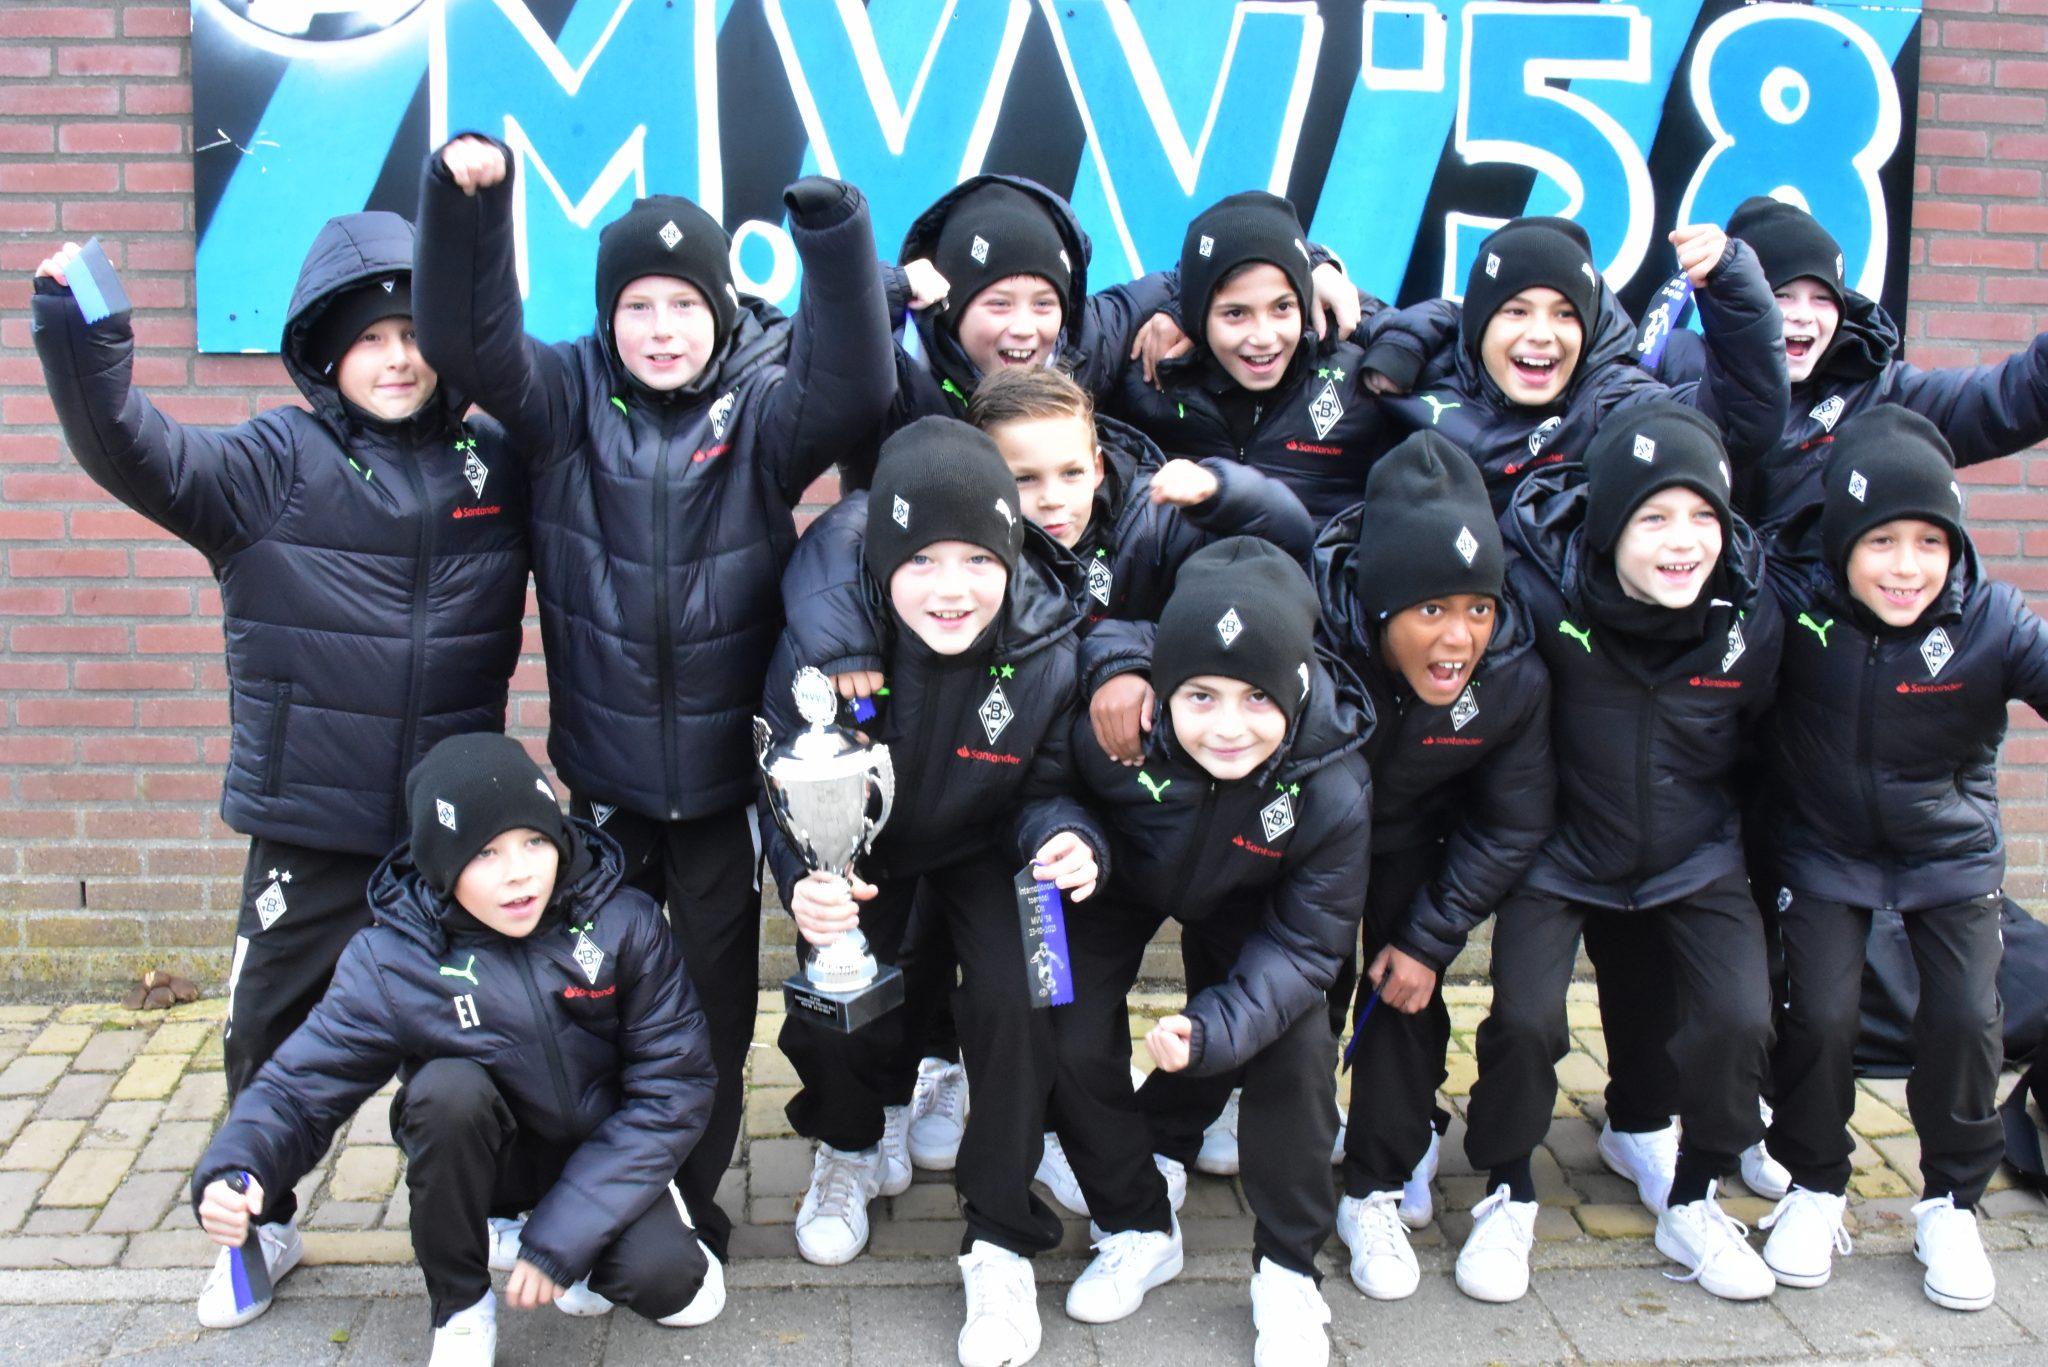 Borussia Monchengladbach wint Internationaal JO11 toernooi